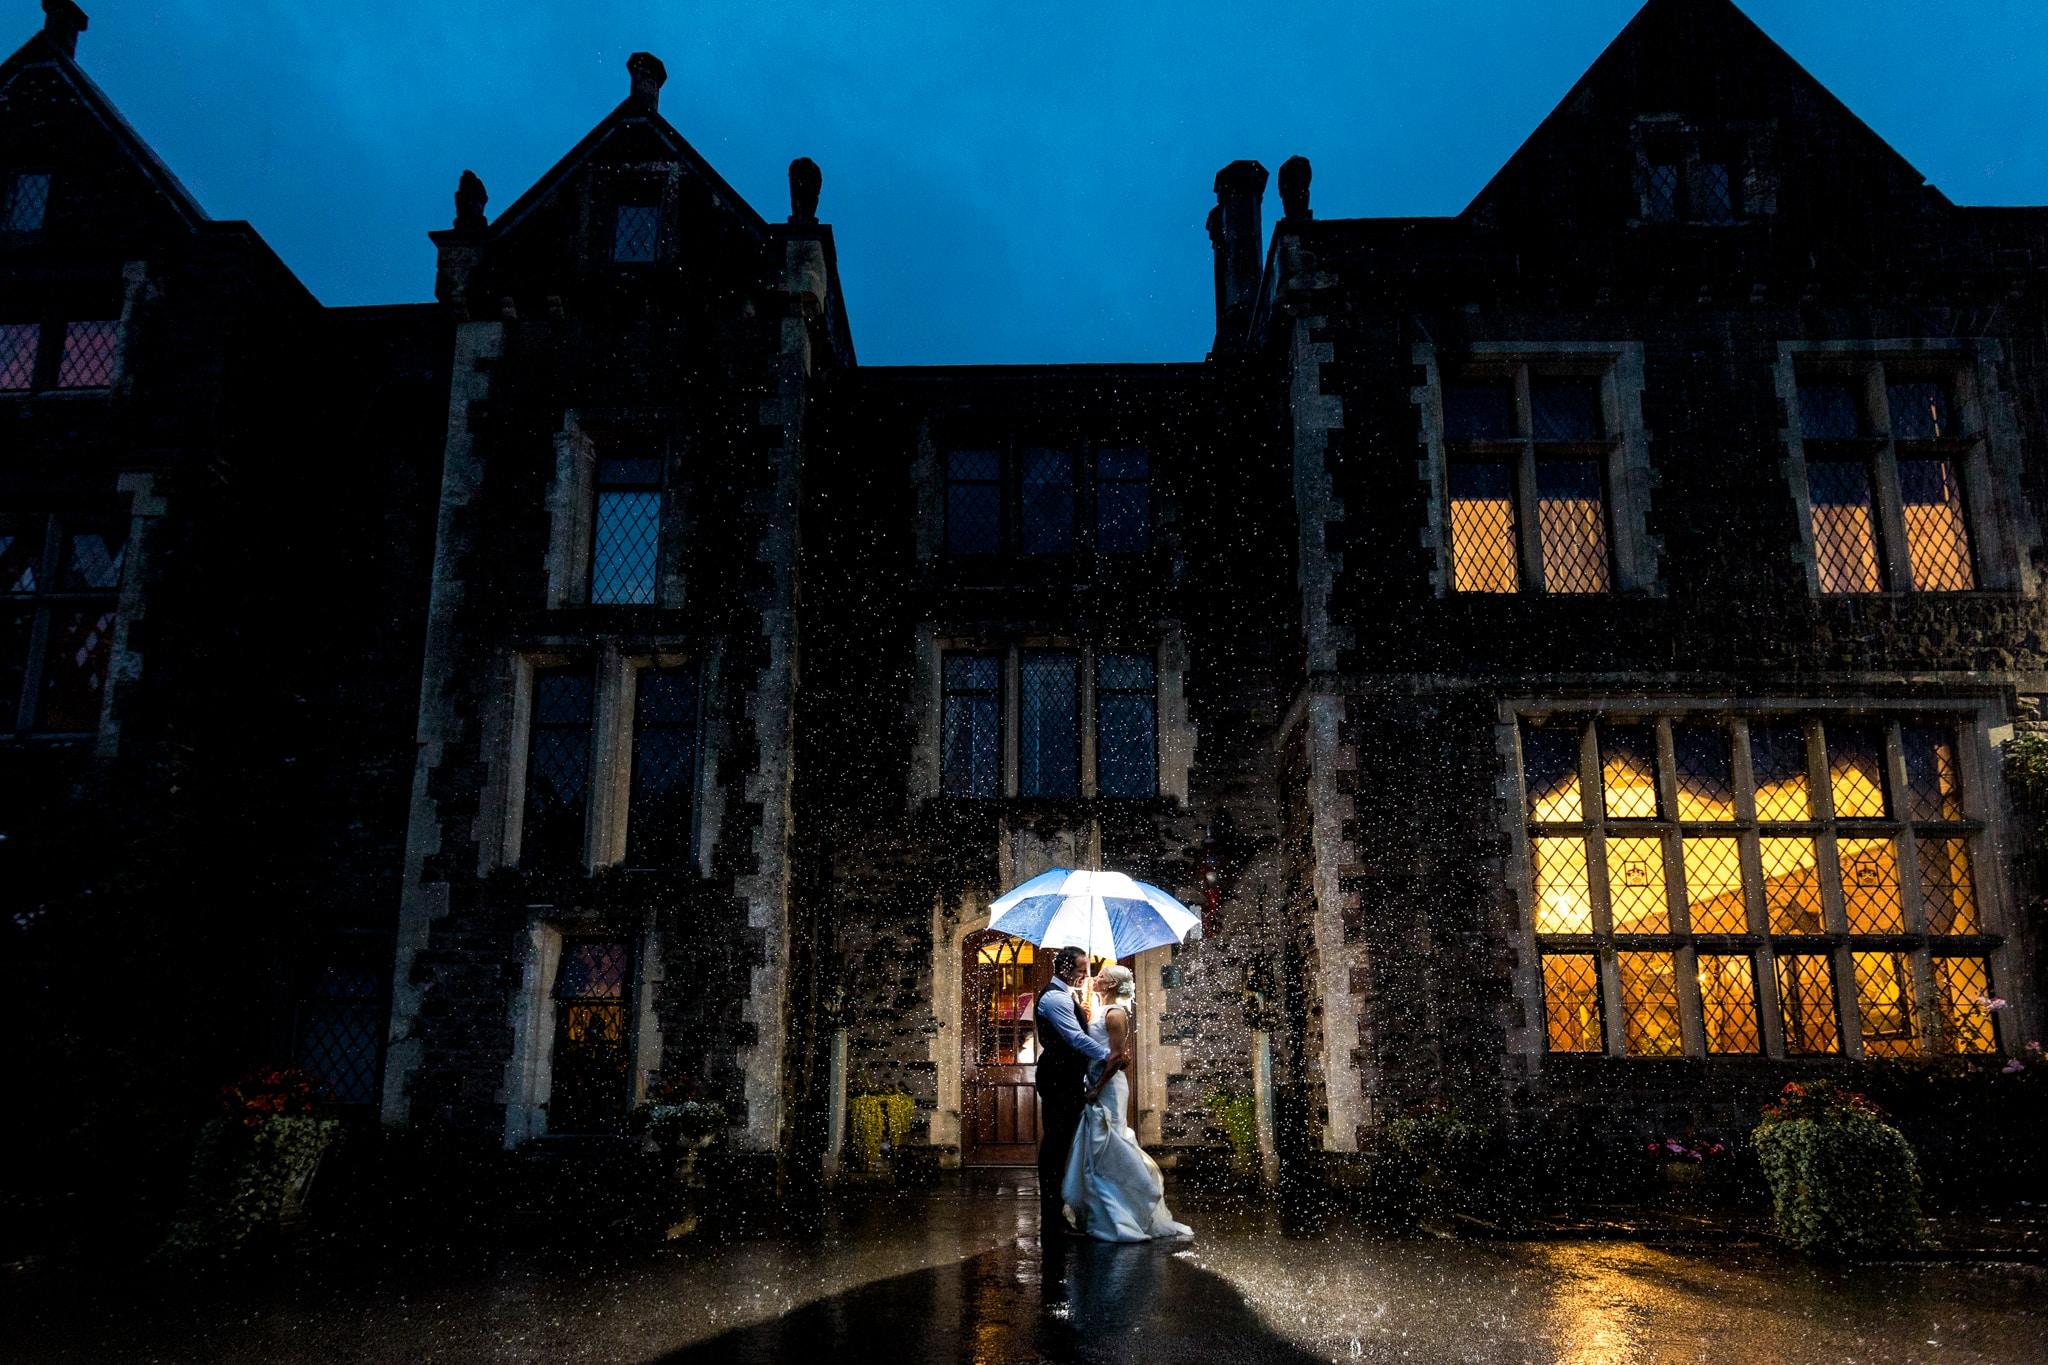 Wedding photographer Cardiff - Miskin Manor Wedding Photography